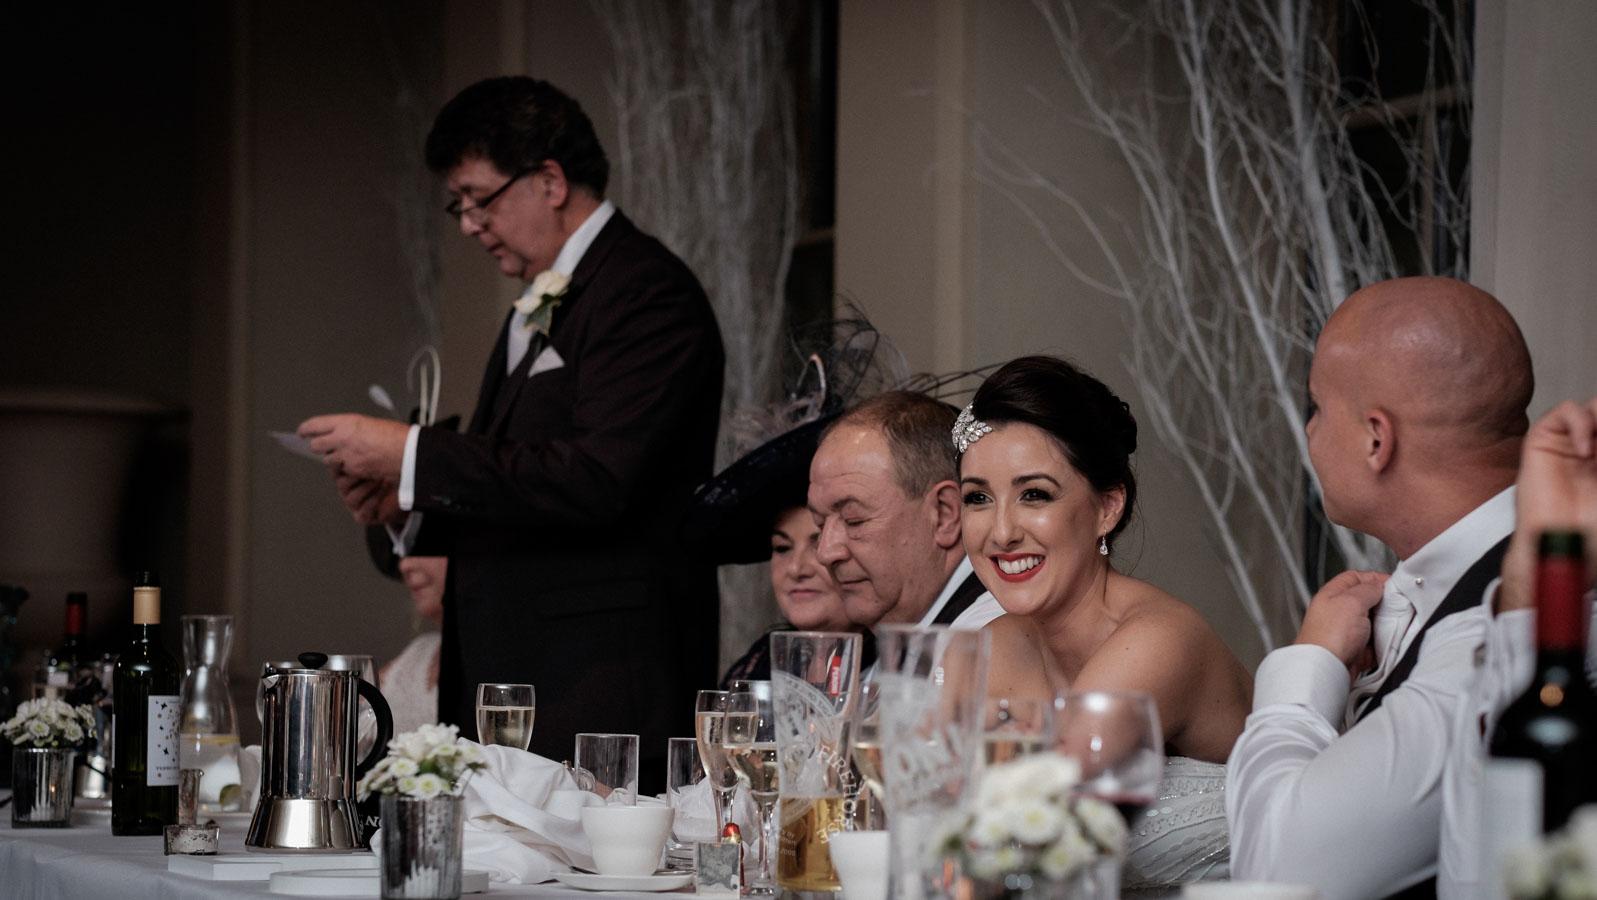 Stubton-Hall-Wedding-Photography-079